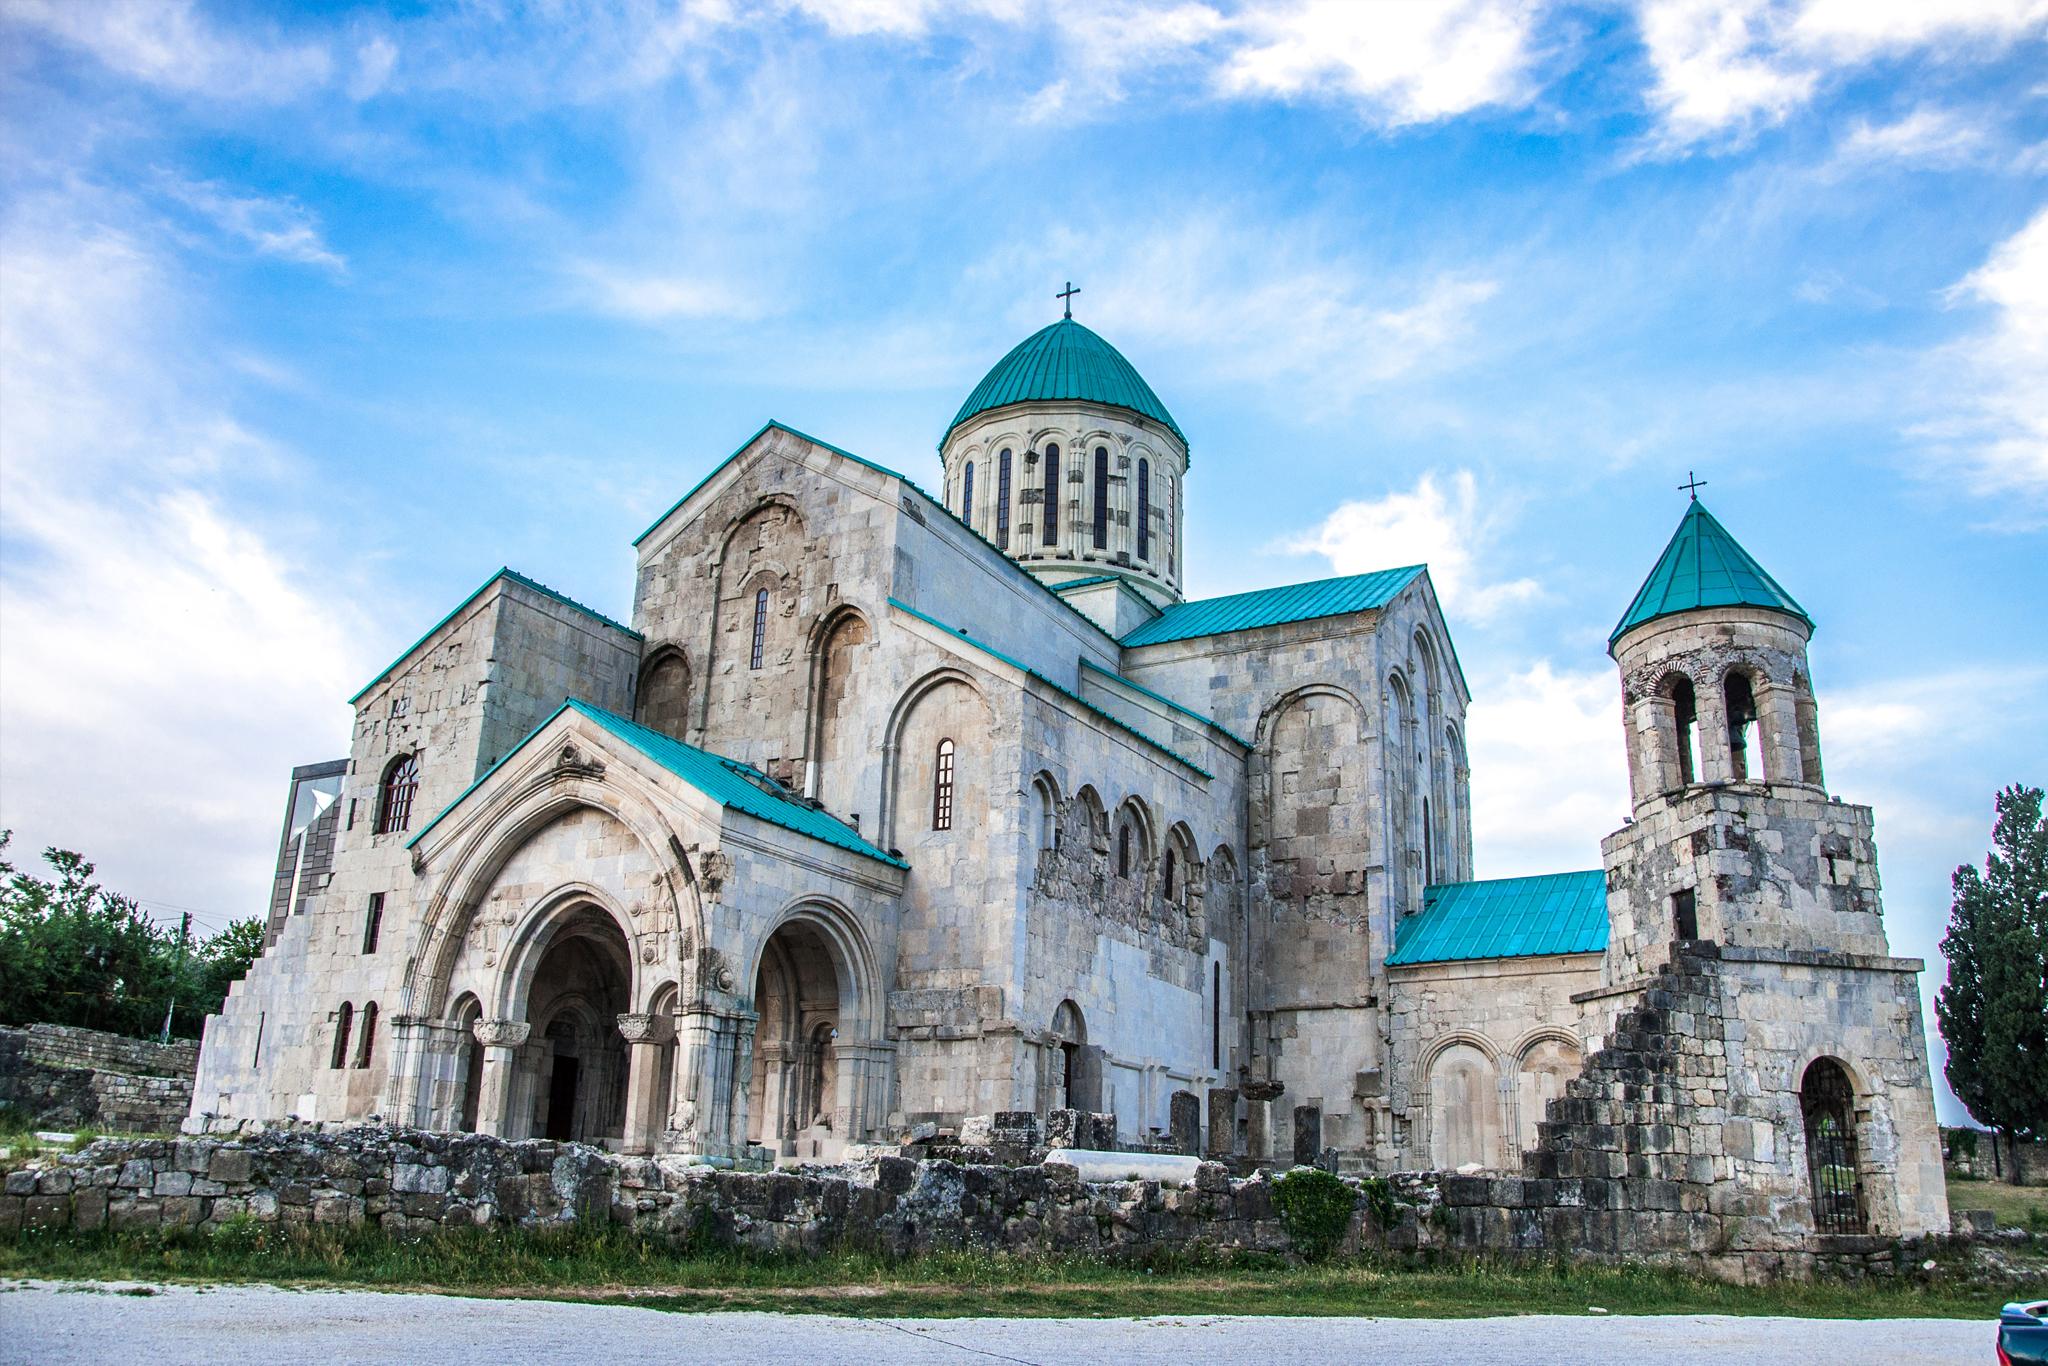 Pueblos con magia y encanto. Georgia_kutaisi_orthodox-church_156647081_0-1